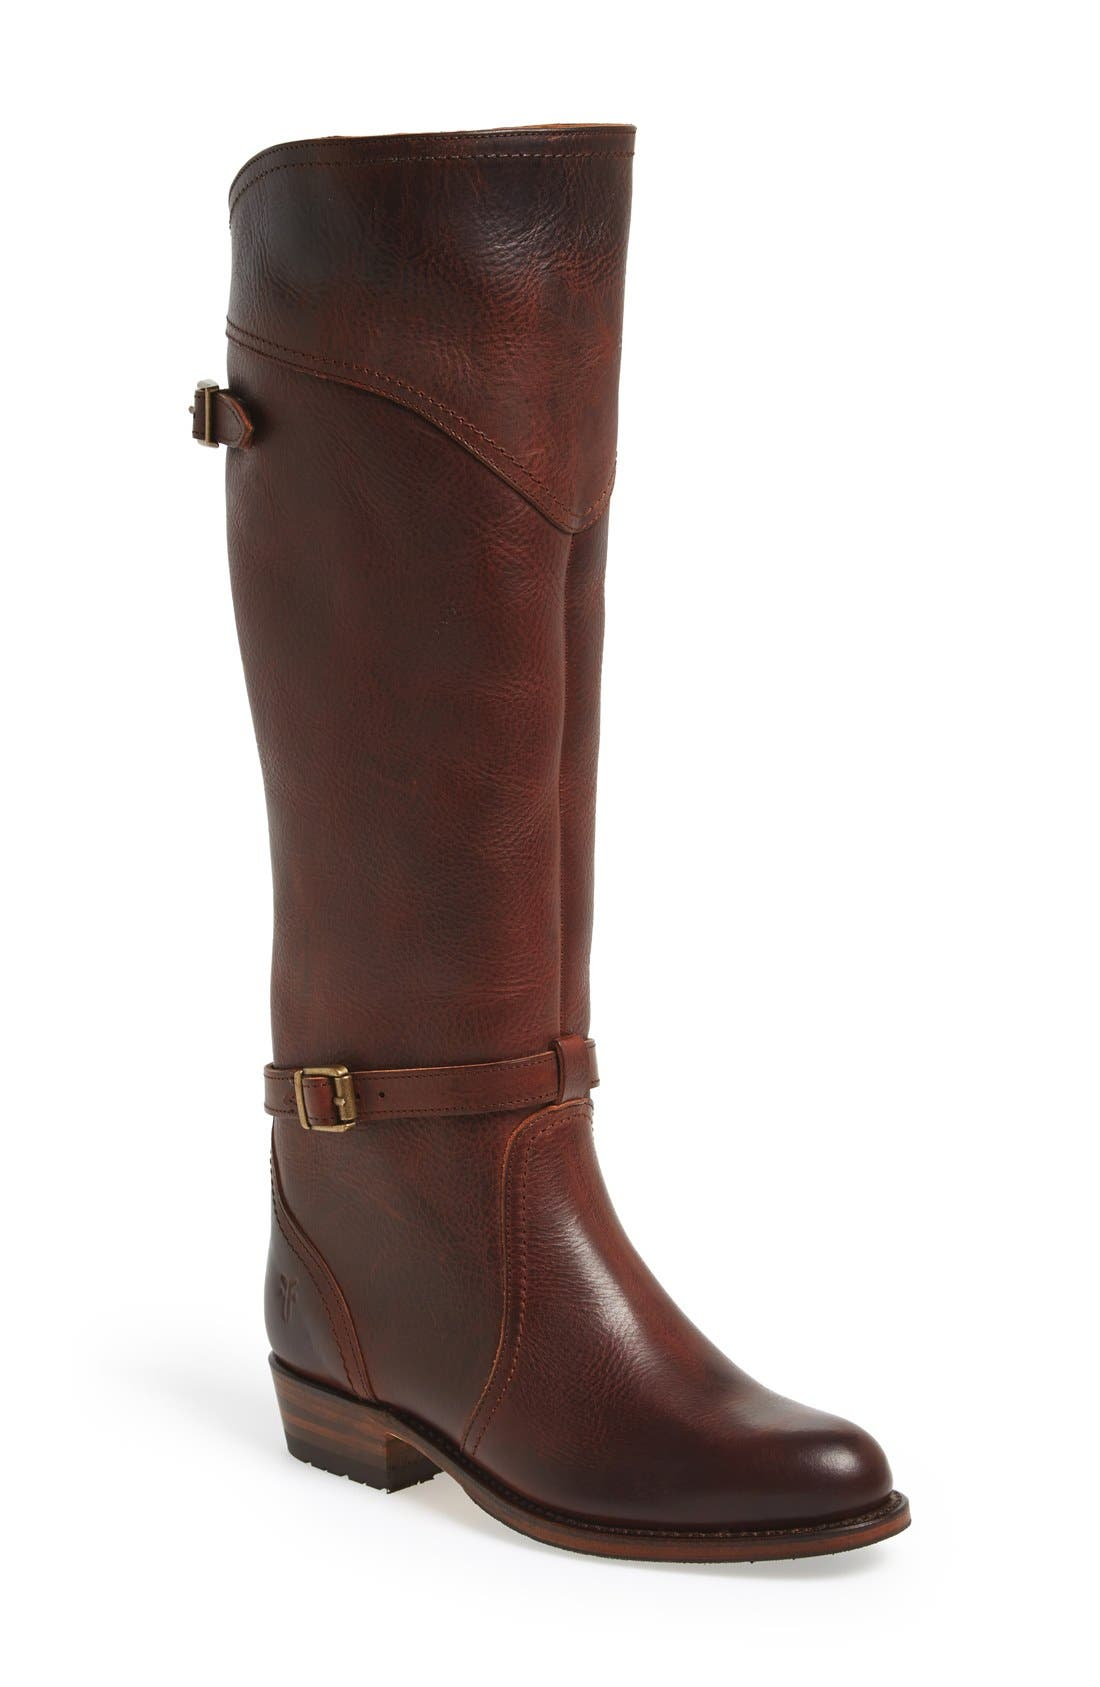 Main Image - Frye 'Durado Lug' Riding Boot (Women)